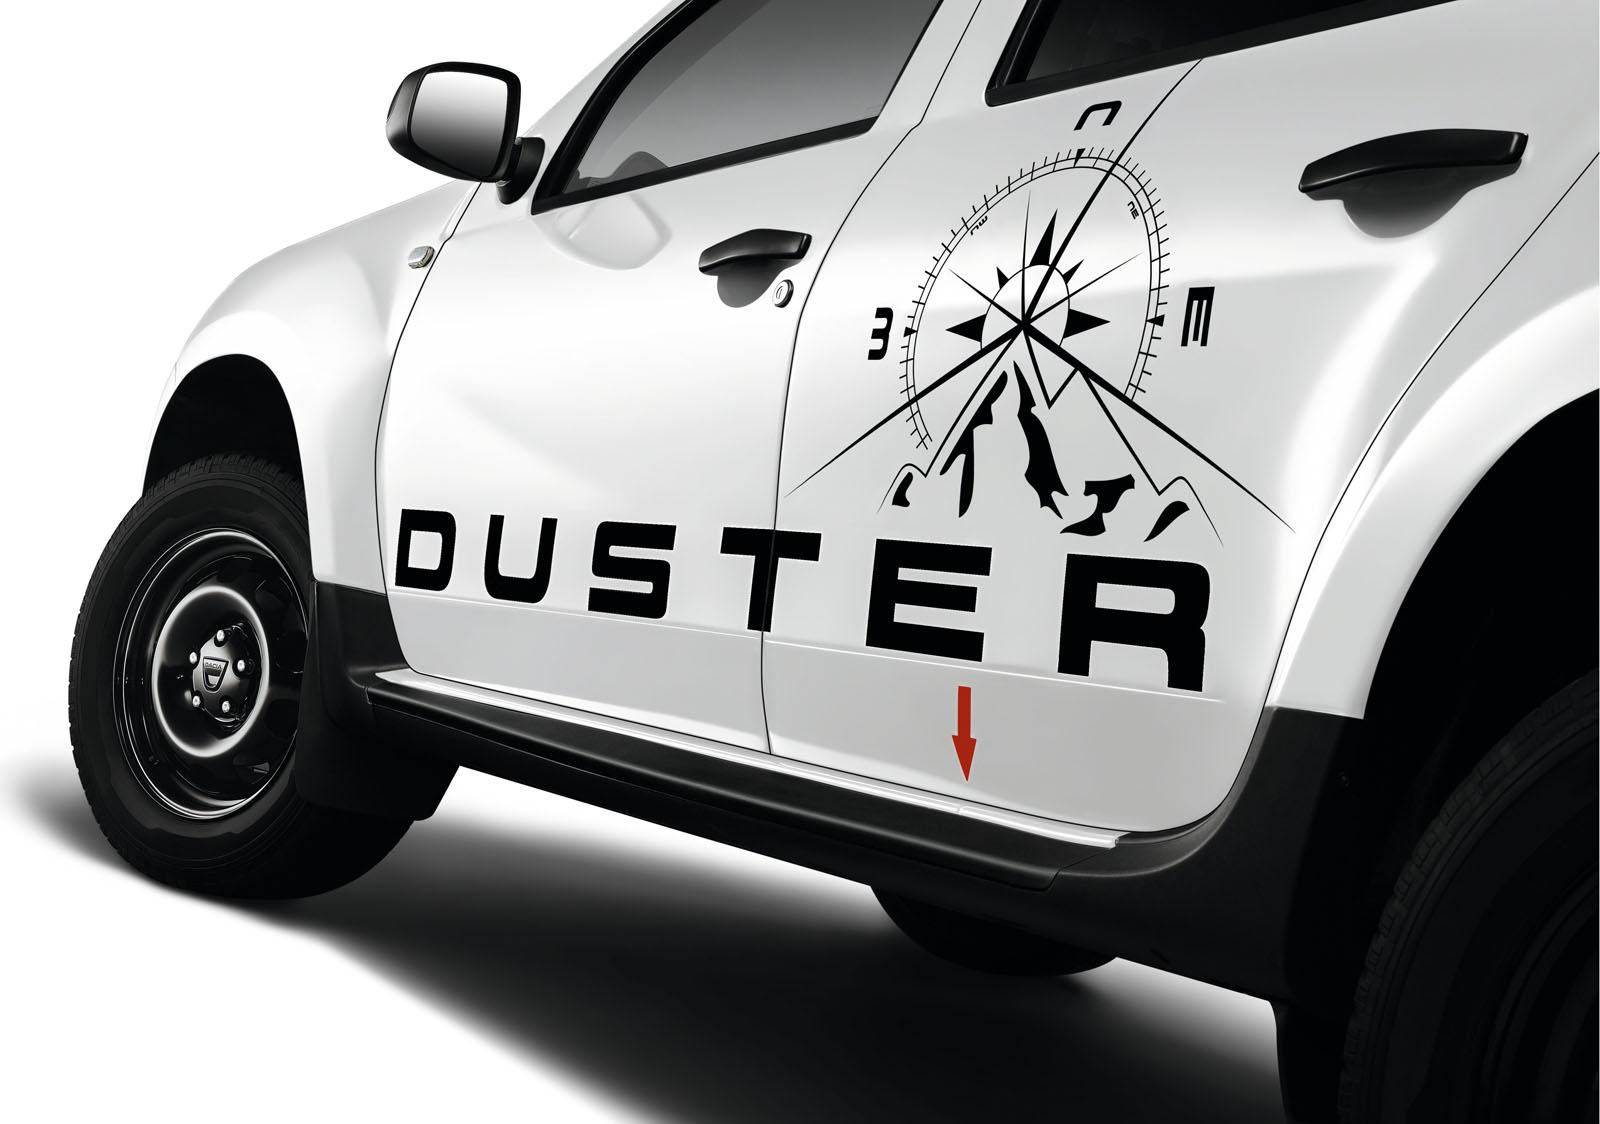 2013 Geneva Motor Show: Dacia Duster Adventure Edition  - фотография №6